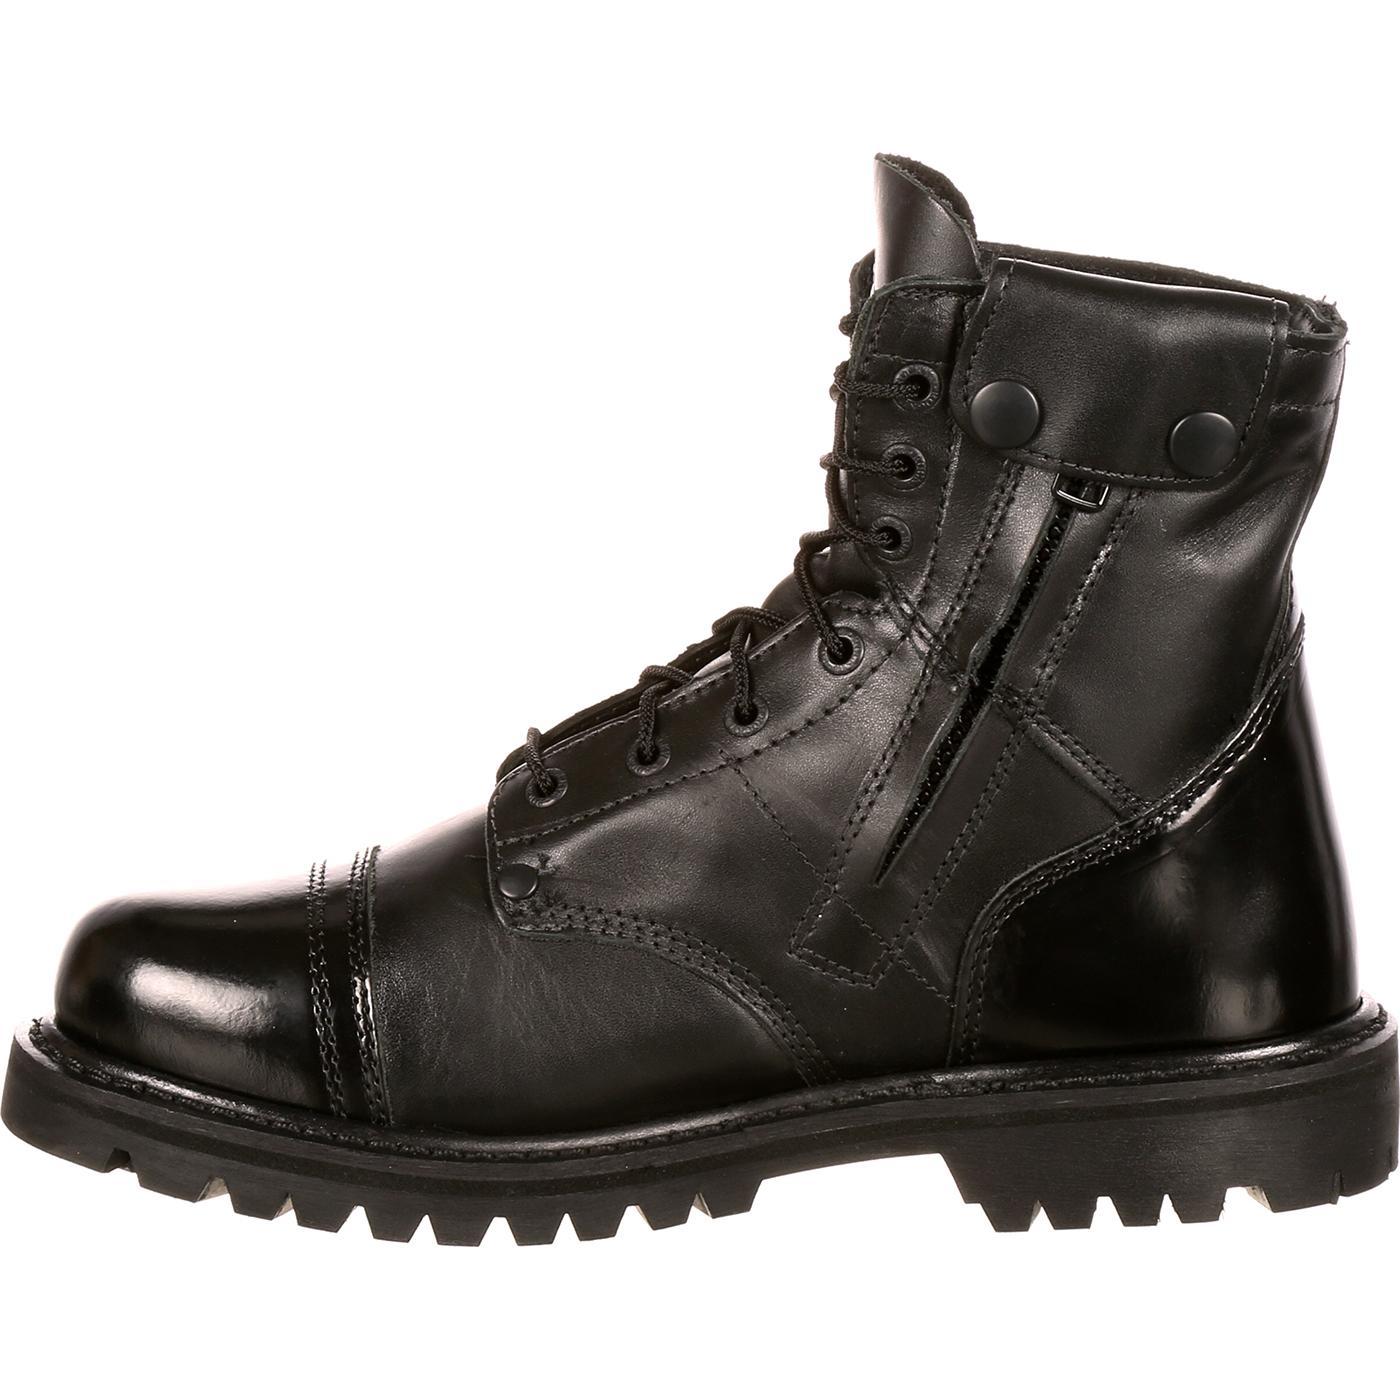 a9f39a0ab23 Men's Black Side Zipper 7-Inch Jump Boot, Rocky Duty Boots